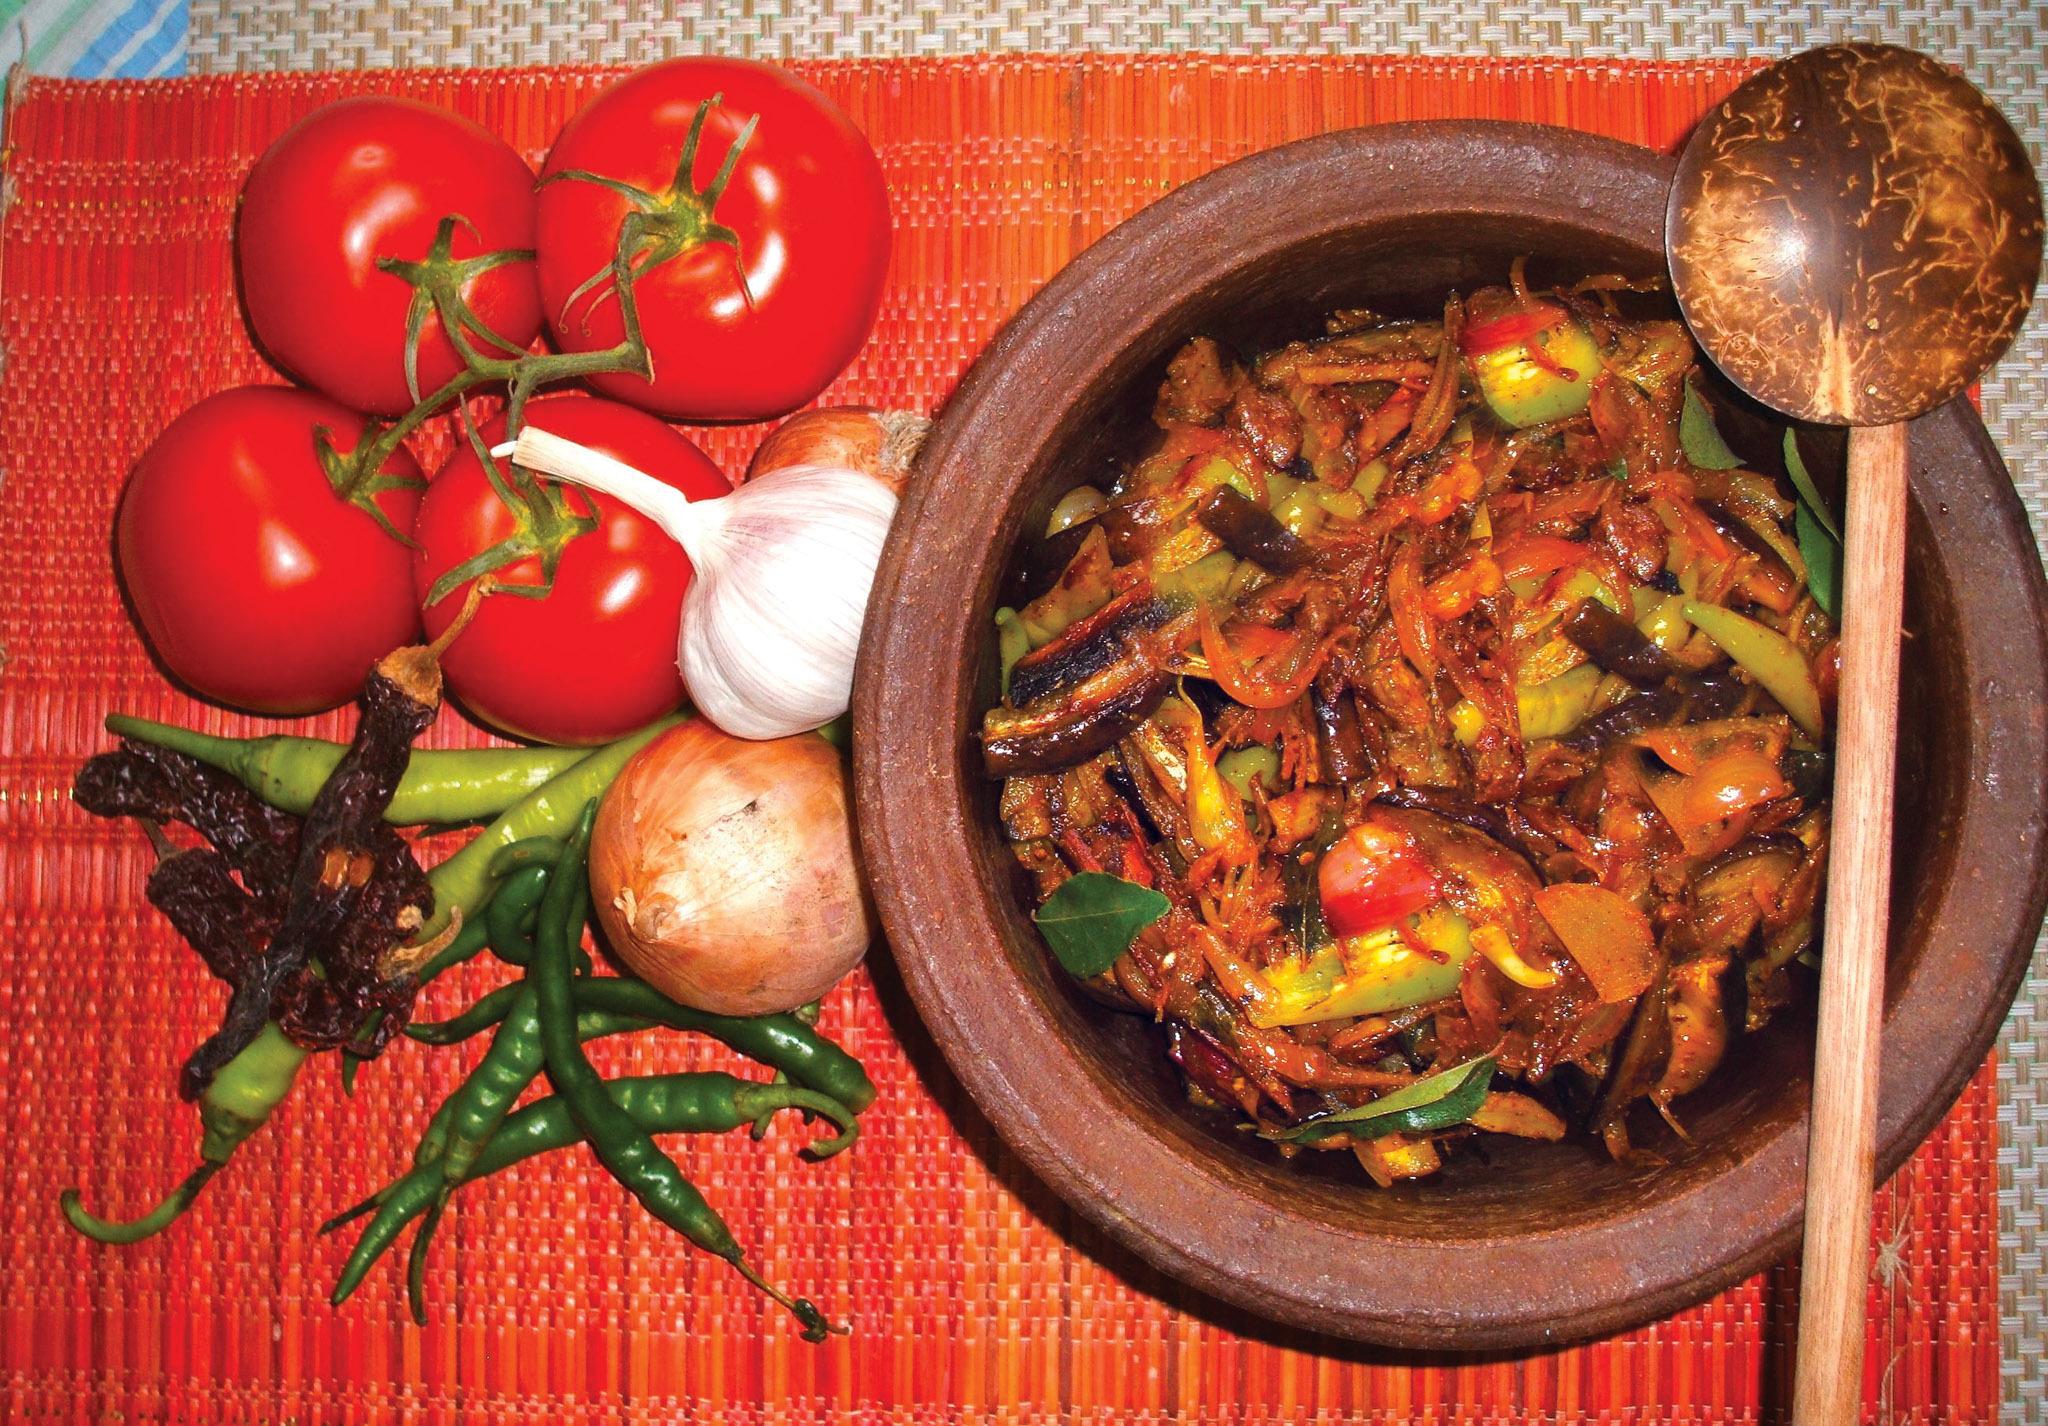 Wambutu moju (aubergine eggplant)